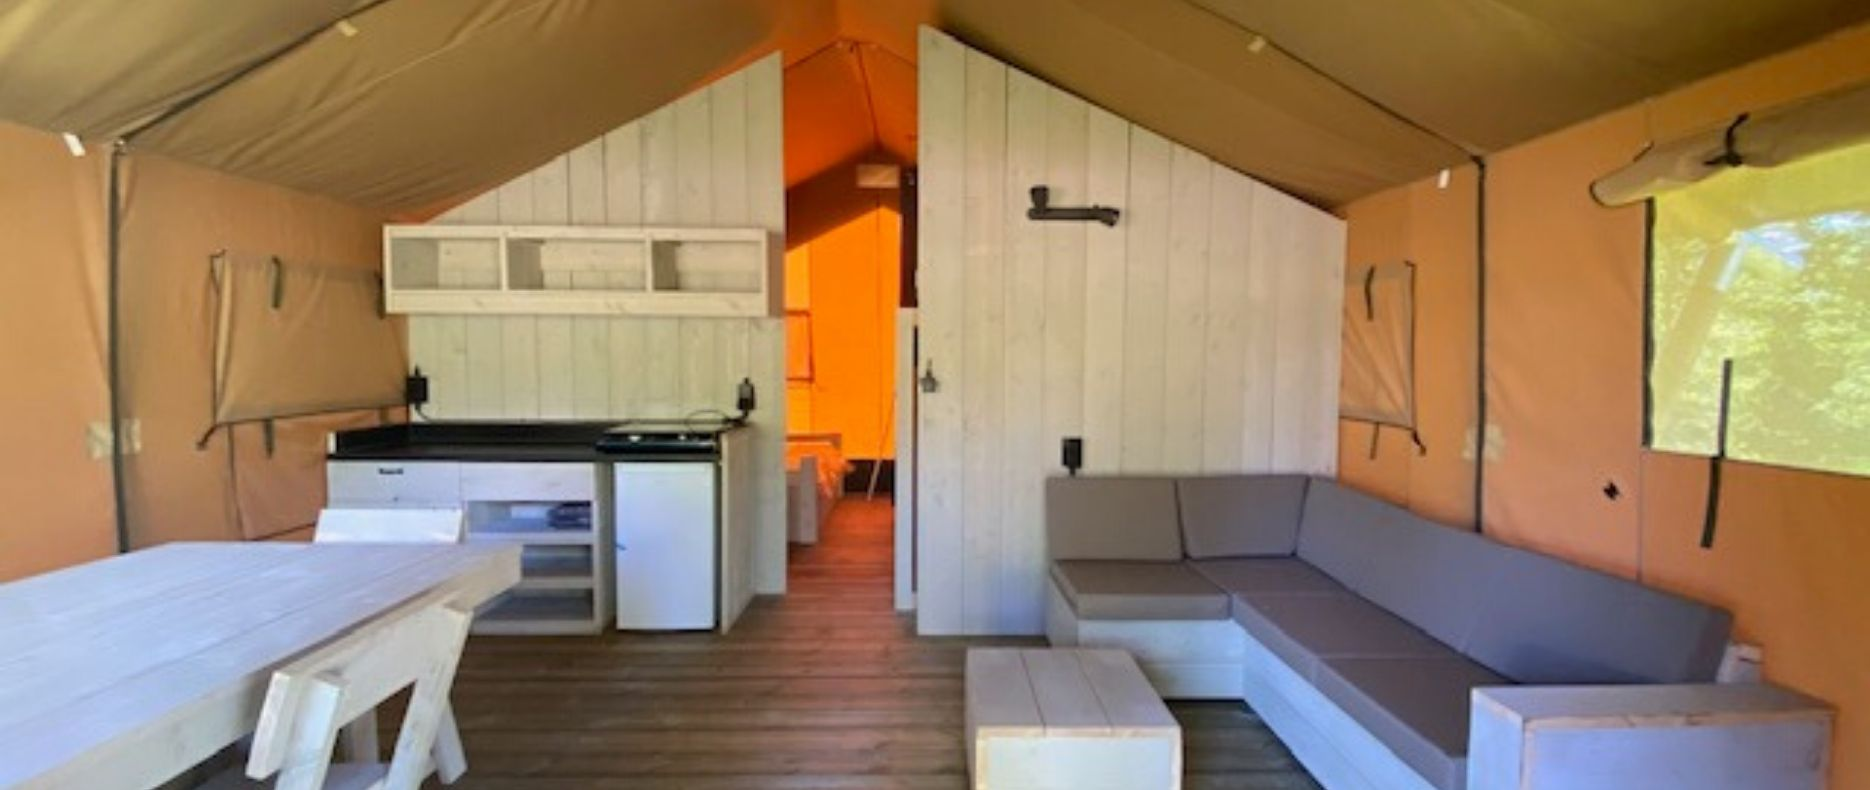 Camping Du Quinquis : Camping Du Quinquis Tente Safari Wood Camping Clohars Carnoet (3)